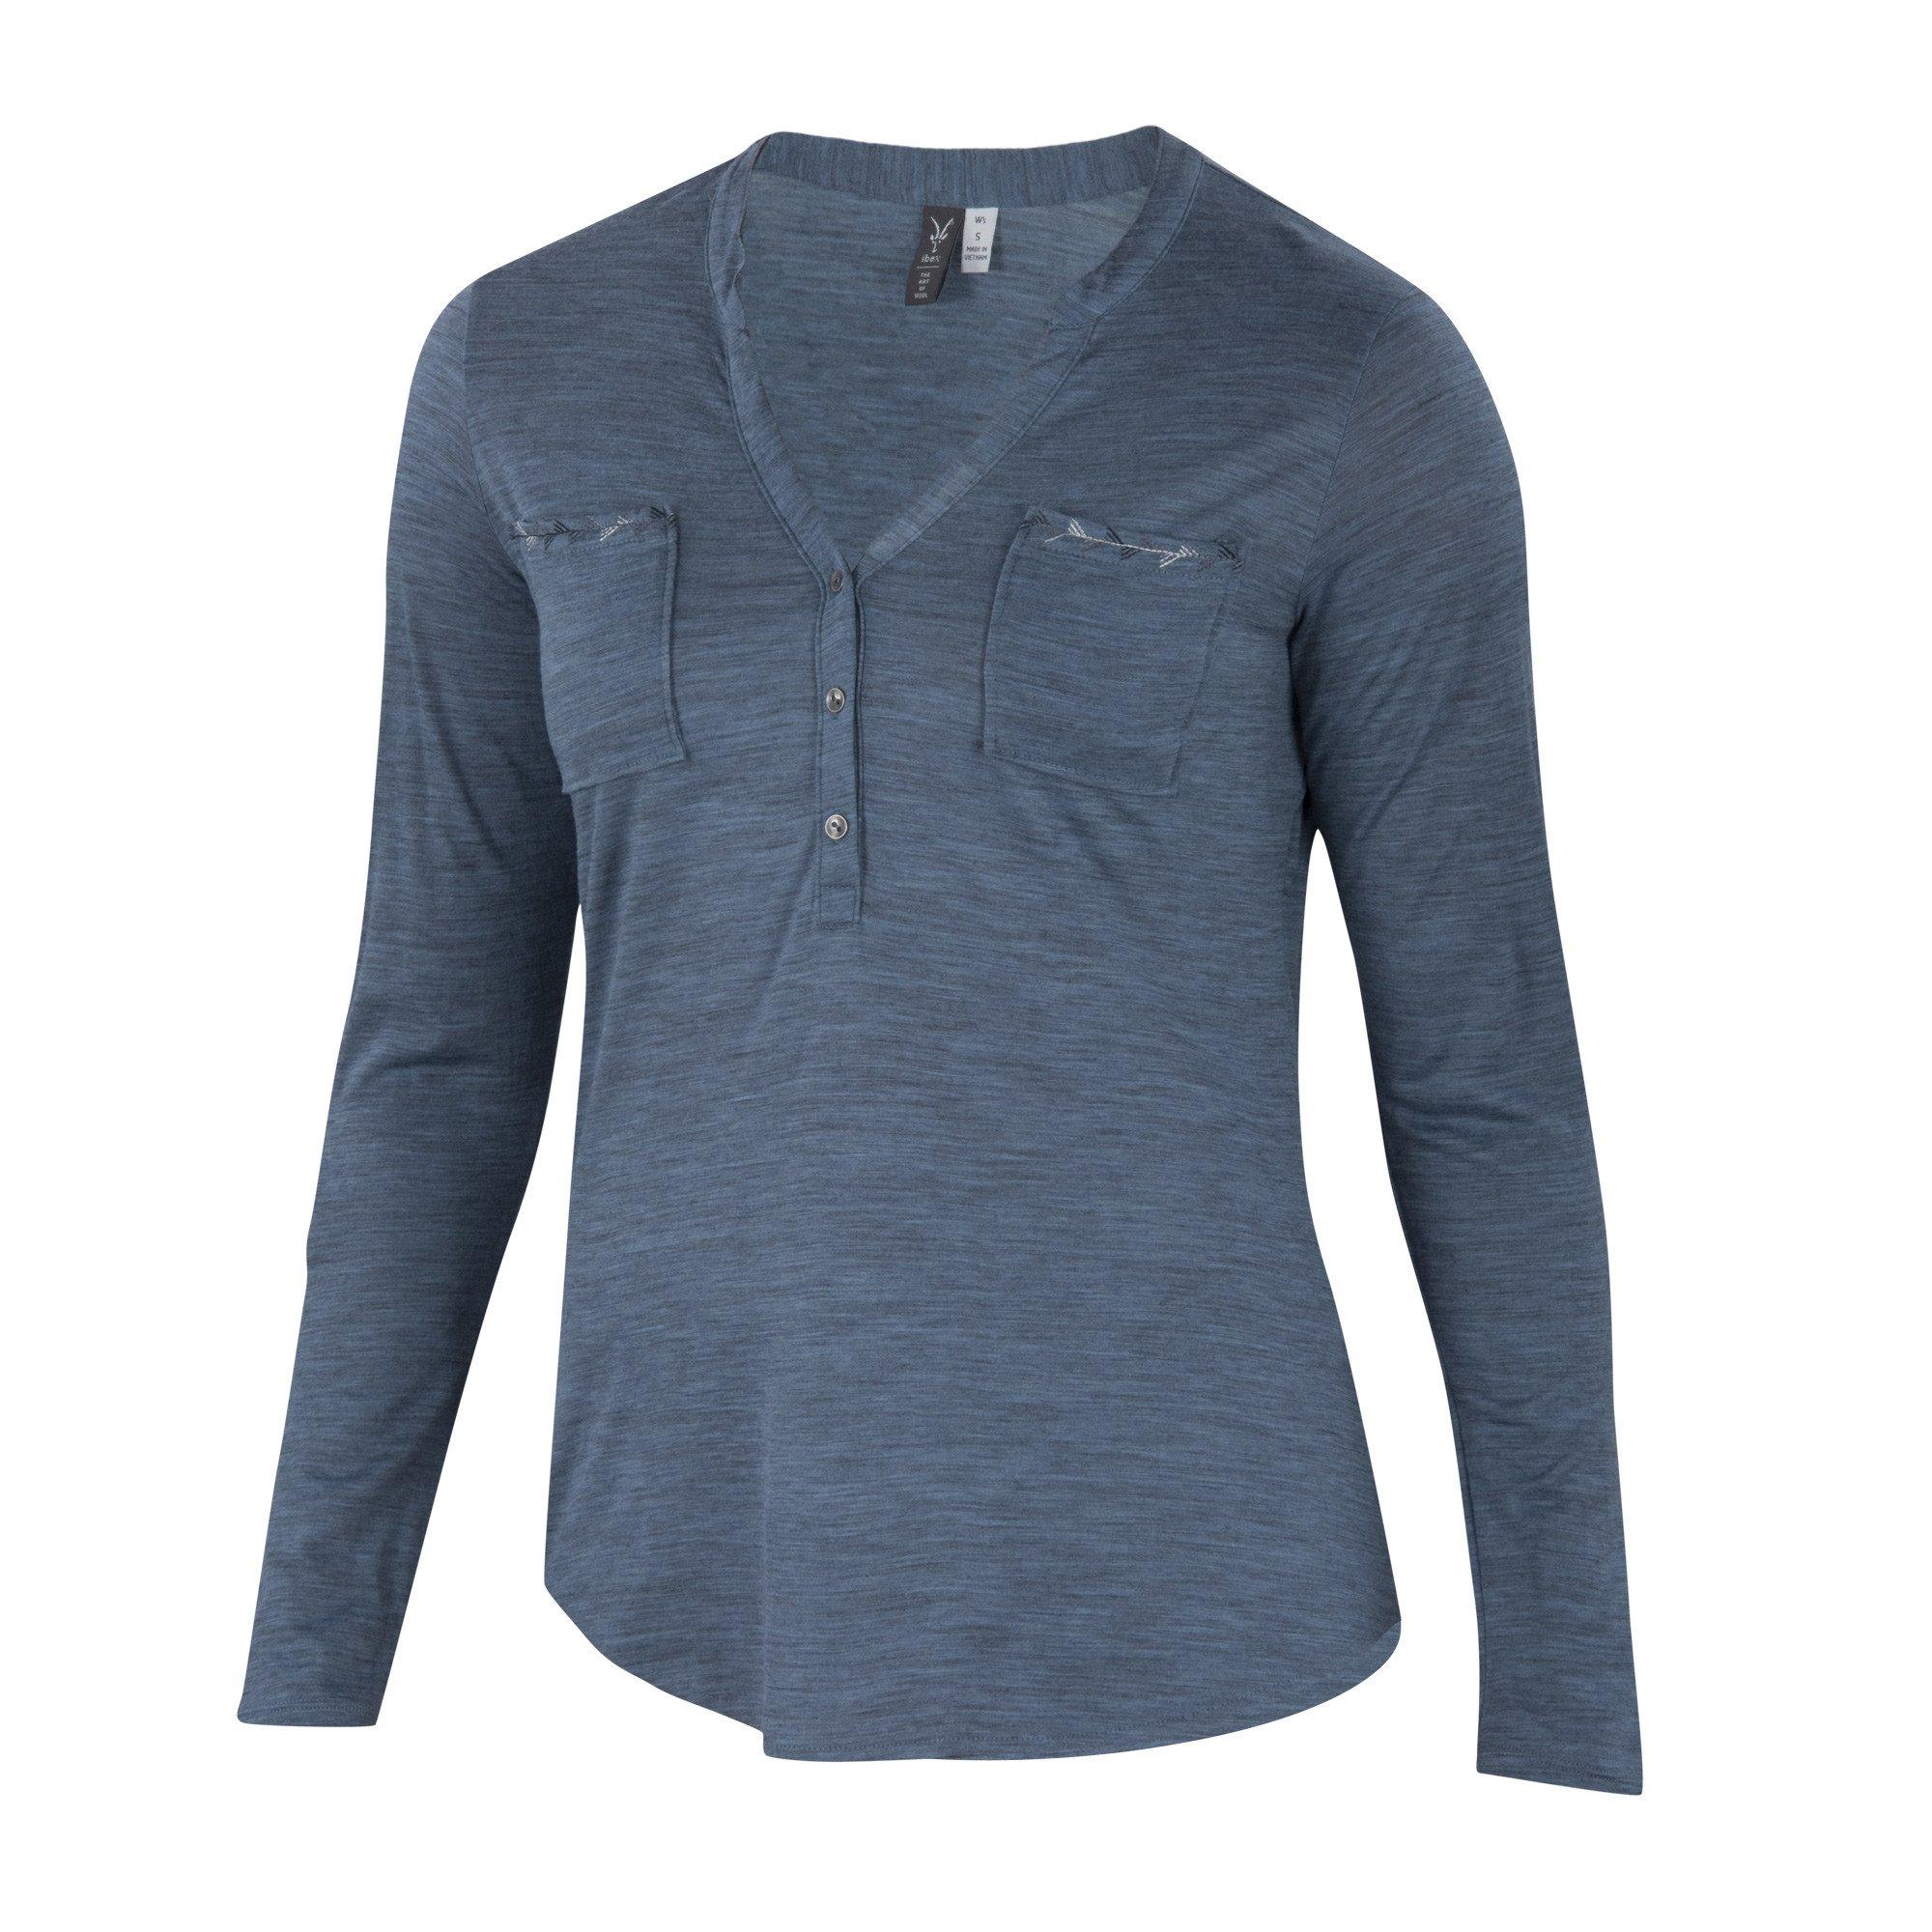 Ibex Shanti Henley Stripe Shirt - Women's Harbor Heather, XL